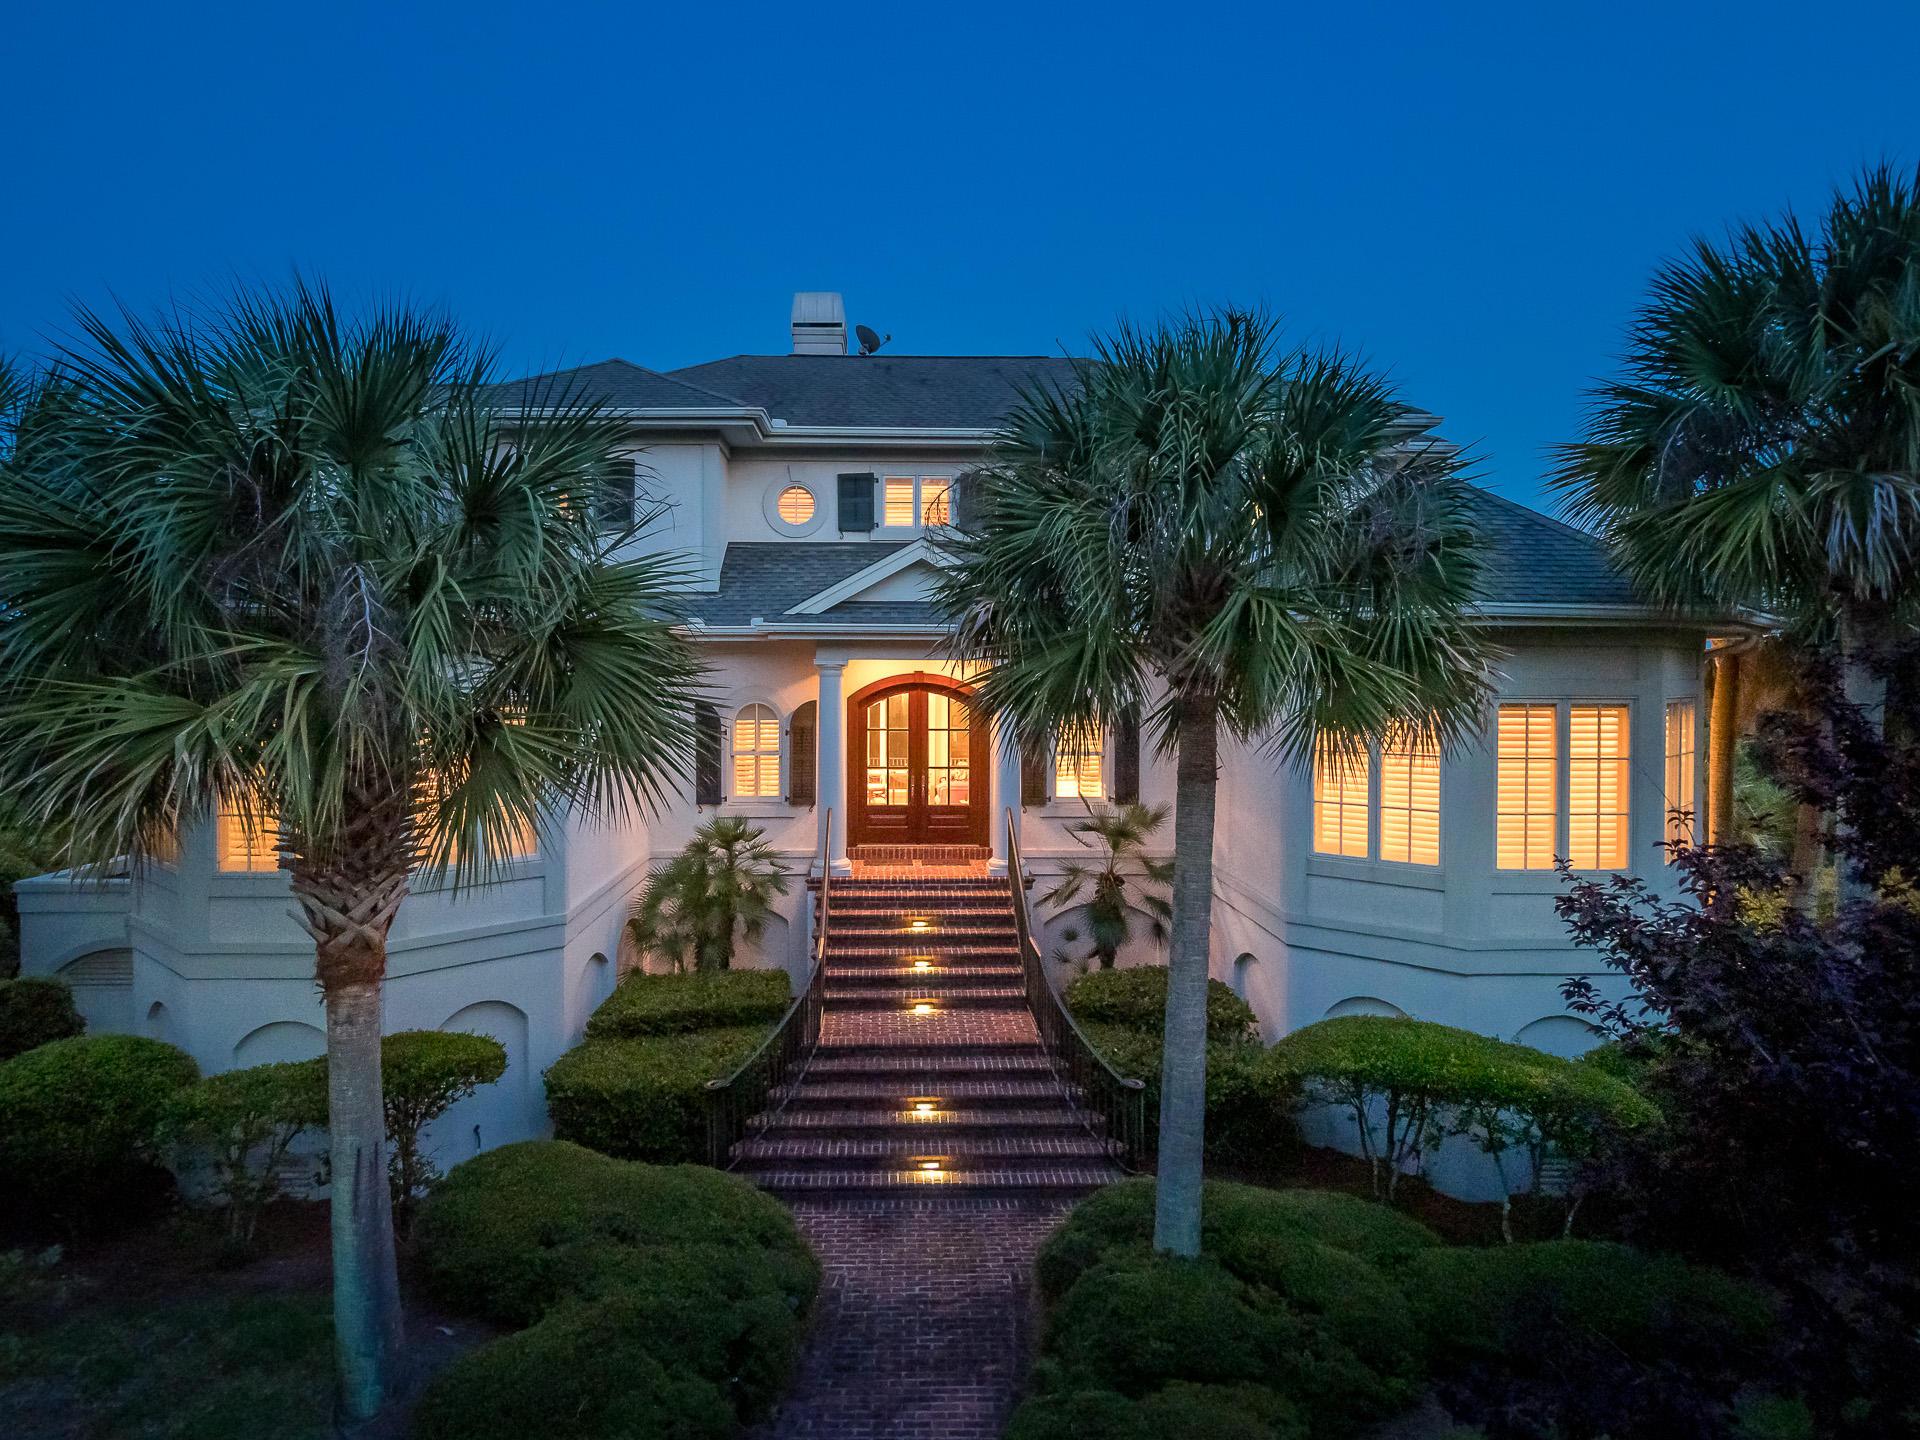 Seabrook Island Homes For Sale - 2216 Rolling Dune, Seabrook Island, SC - 76